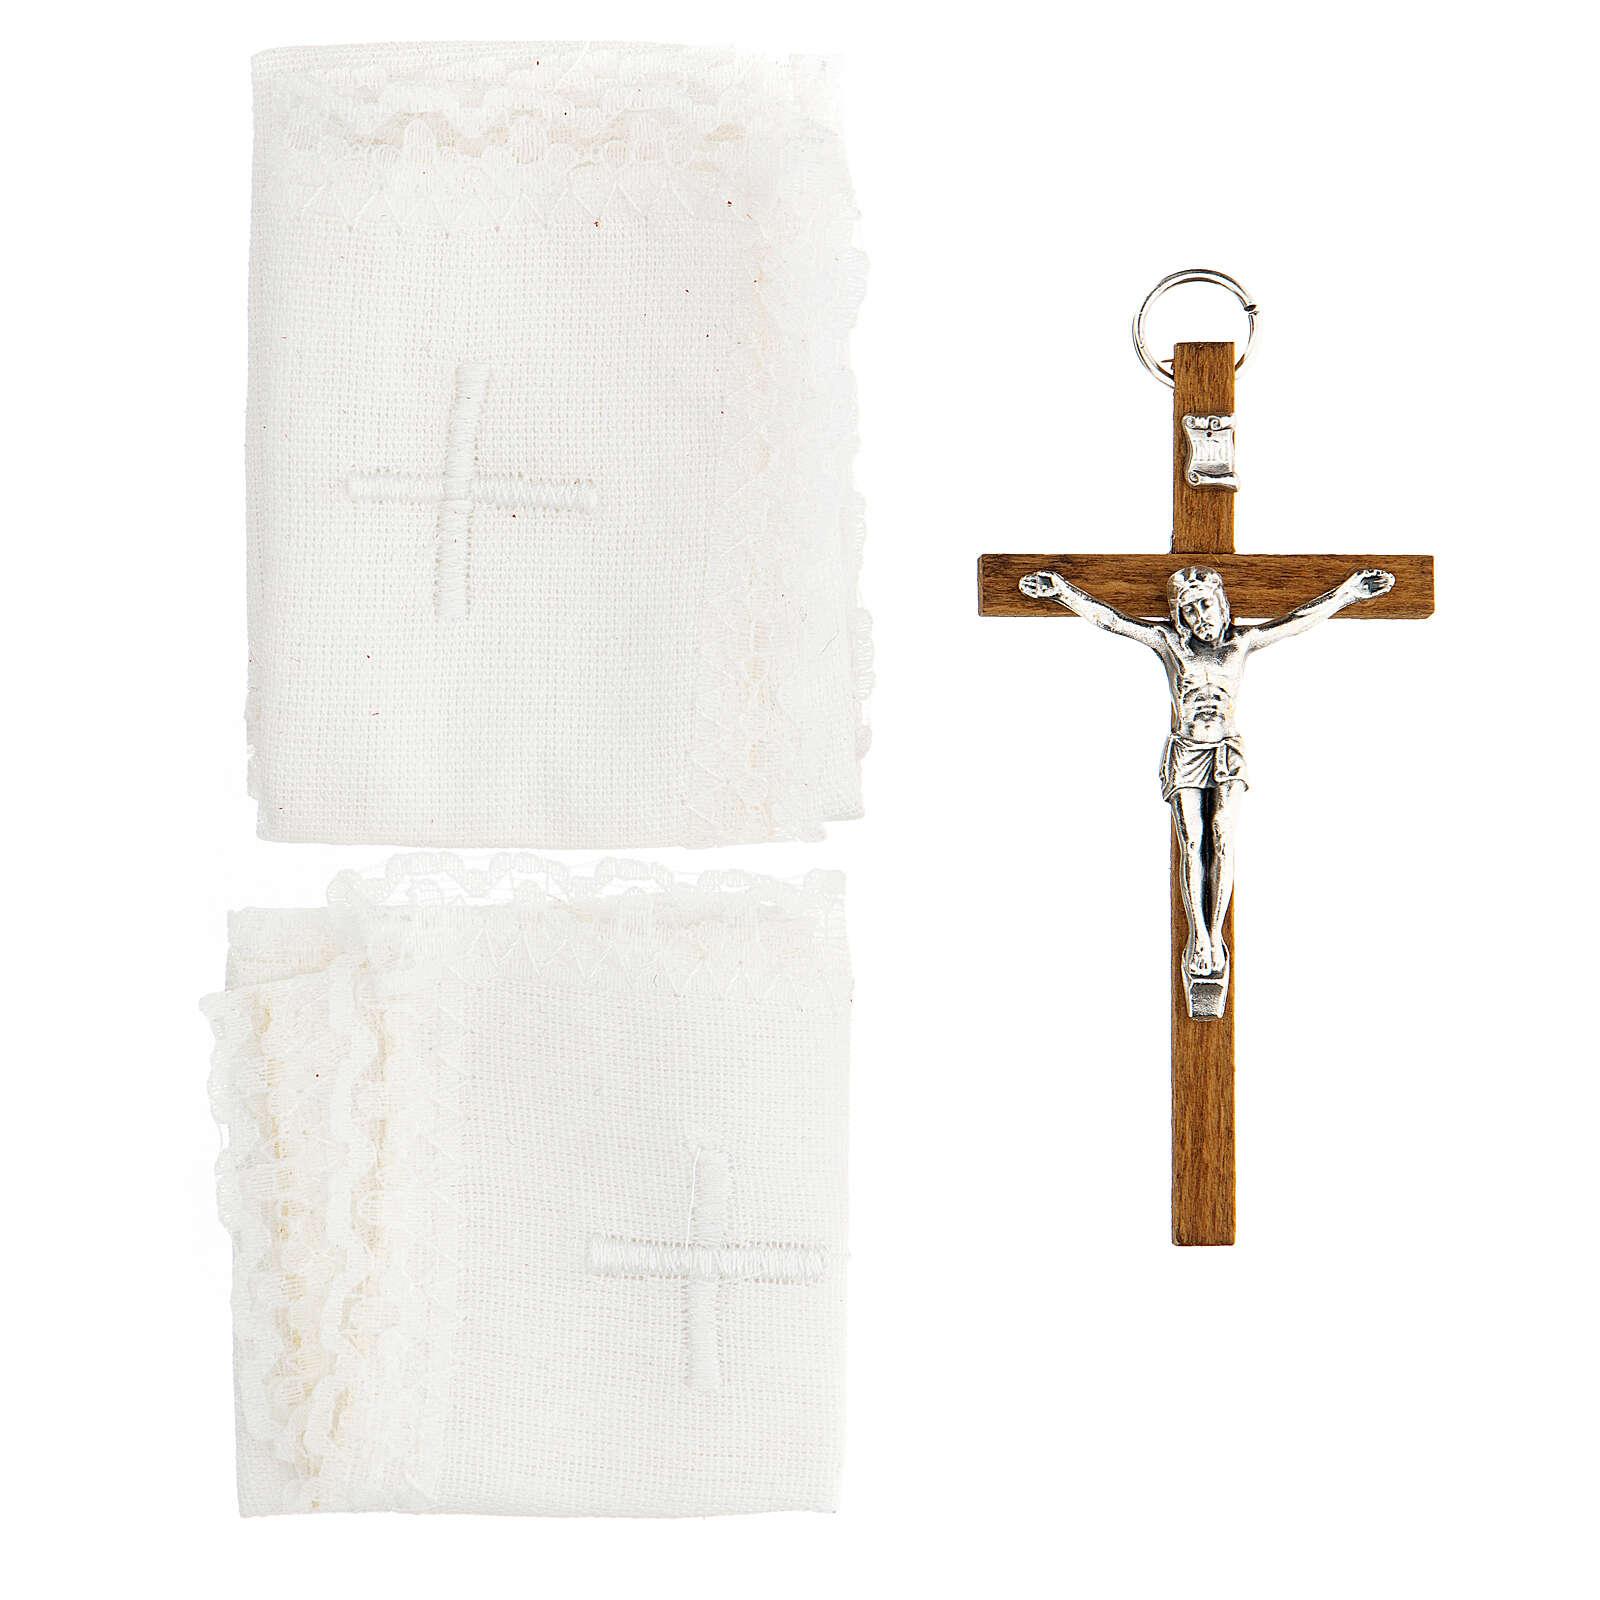 Viaticum set leather case with altar 3